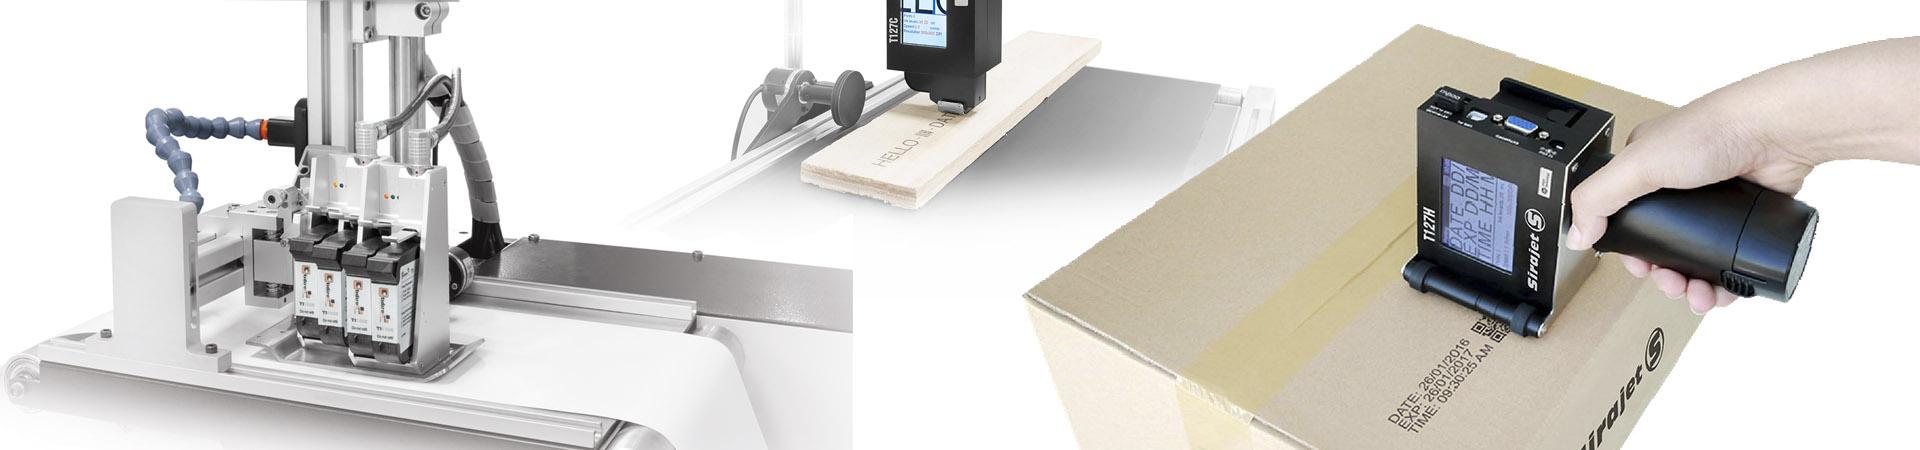 HP Tidirefi® TIJ 2.5 impresora térmica